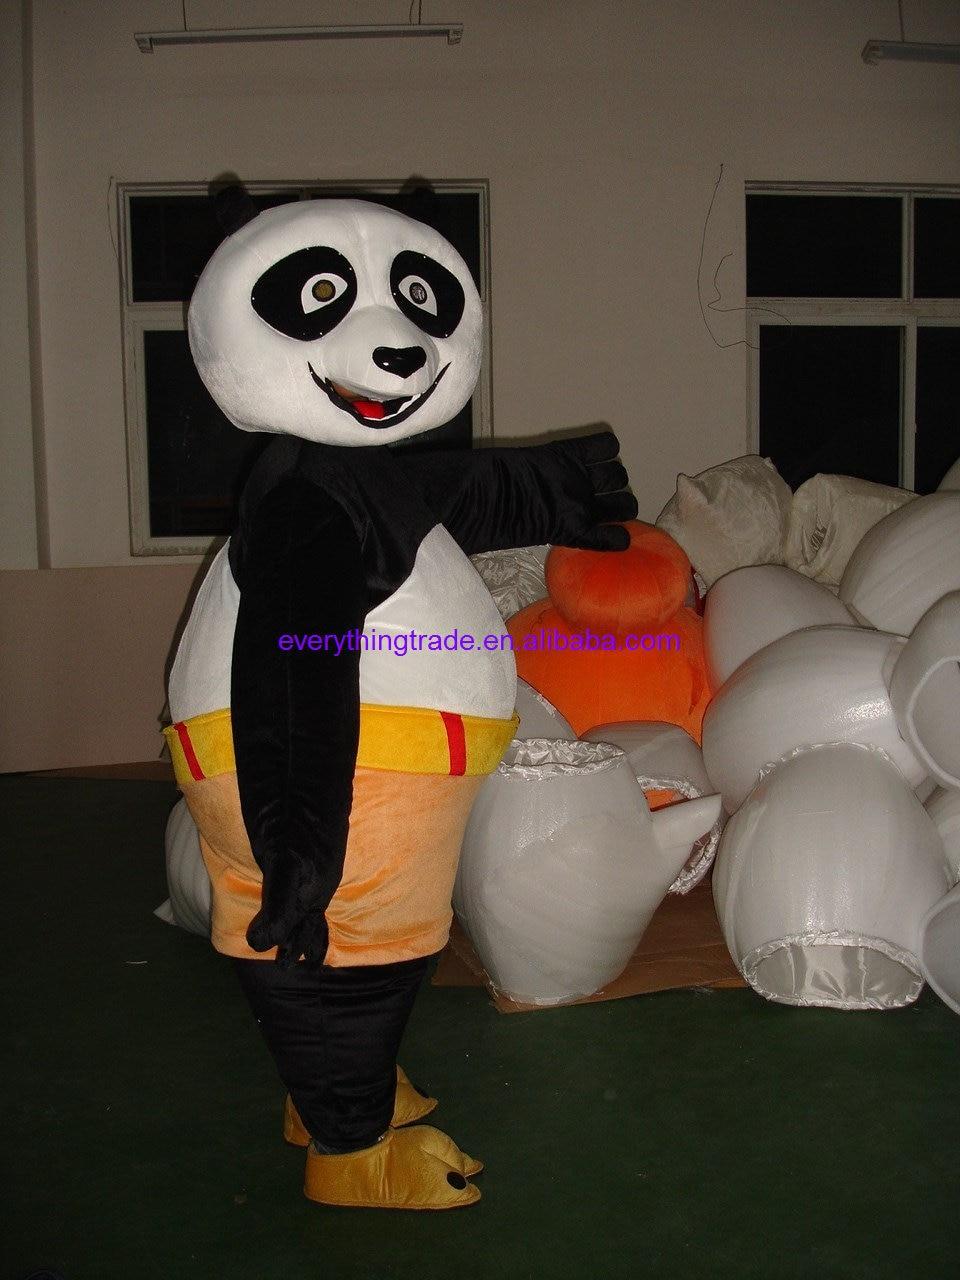 hot sale 2014 cartoon character adult popaul kung fu panda mascot costume halloween party - Kung Fu Panda Halloween